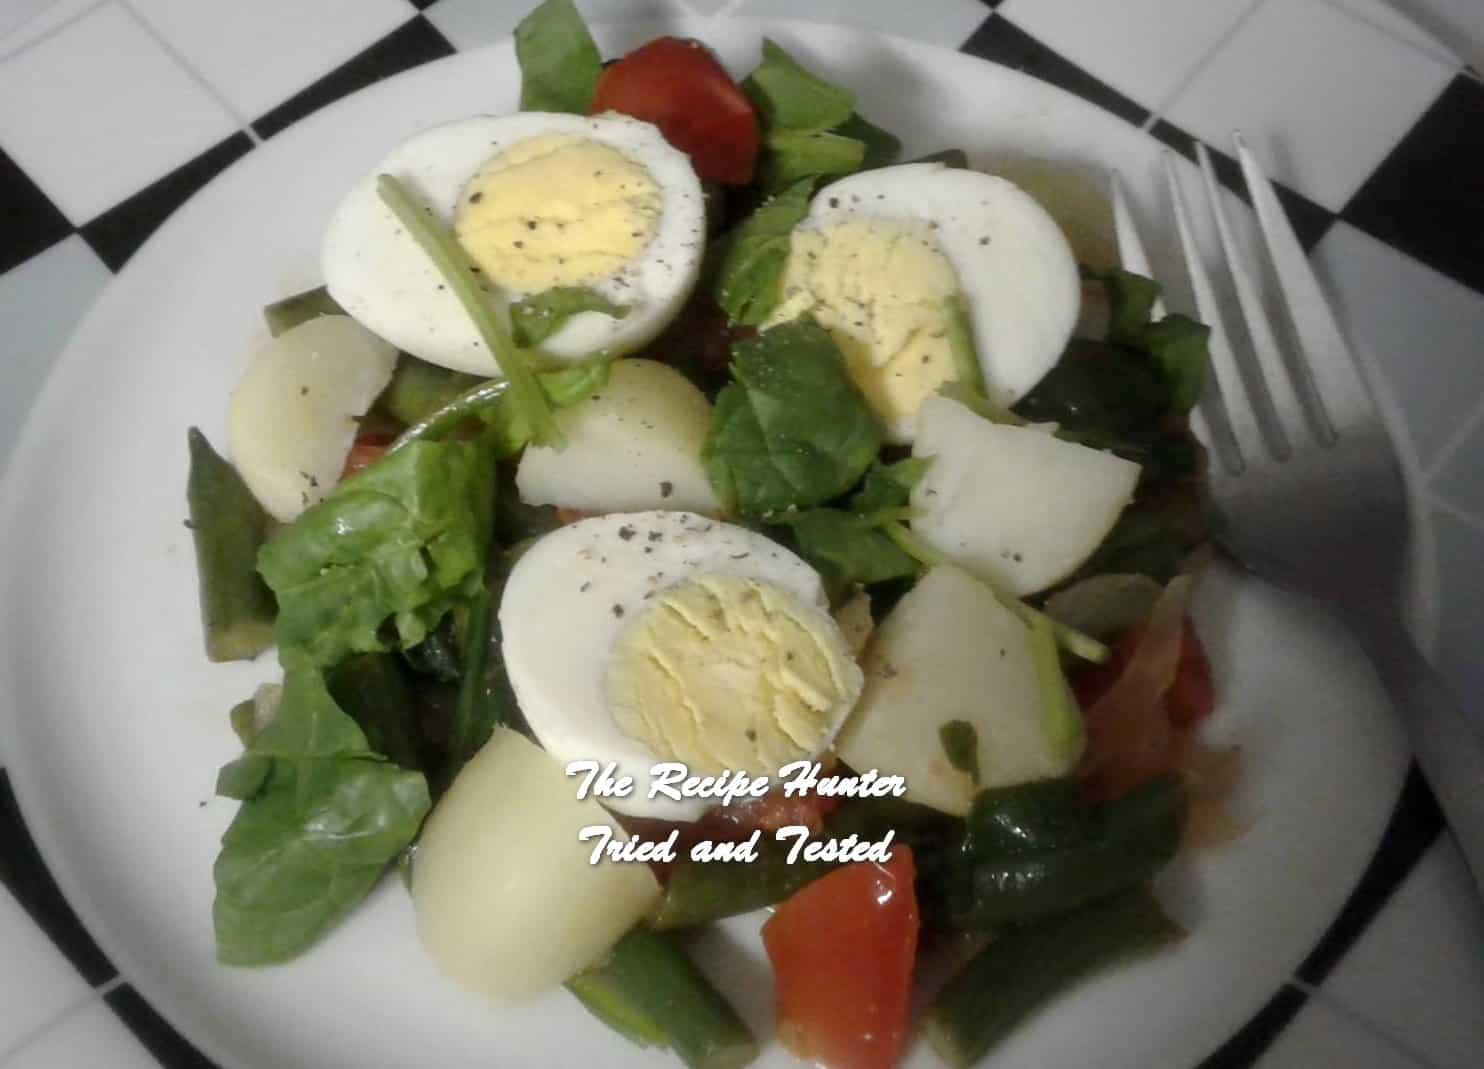 Nazley's Warm Egg Salad for supper